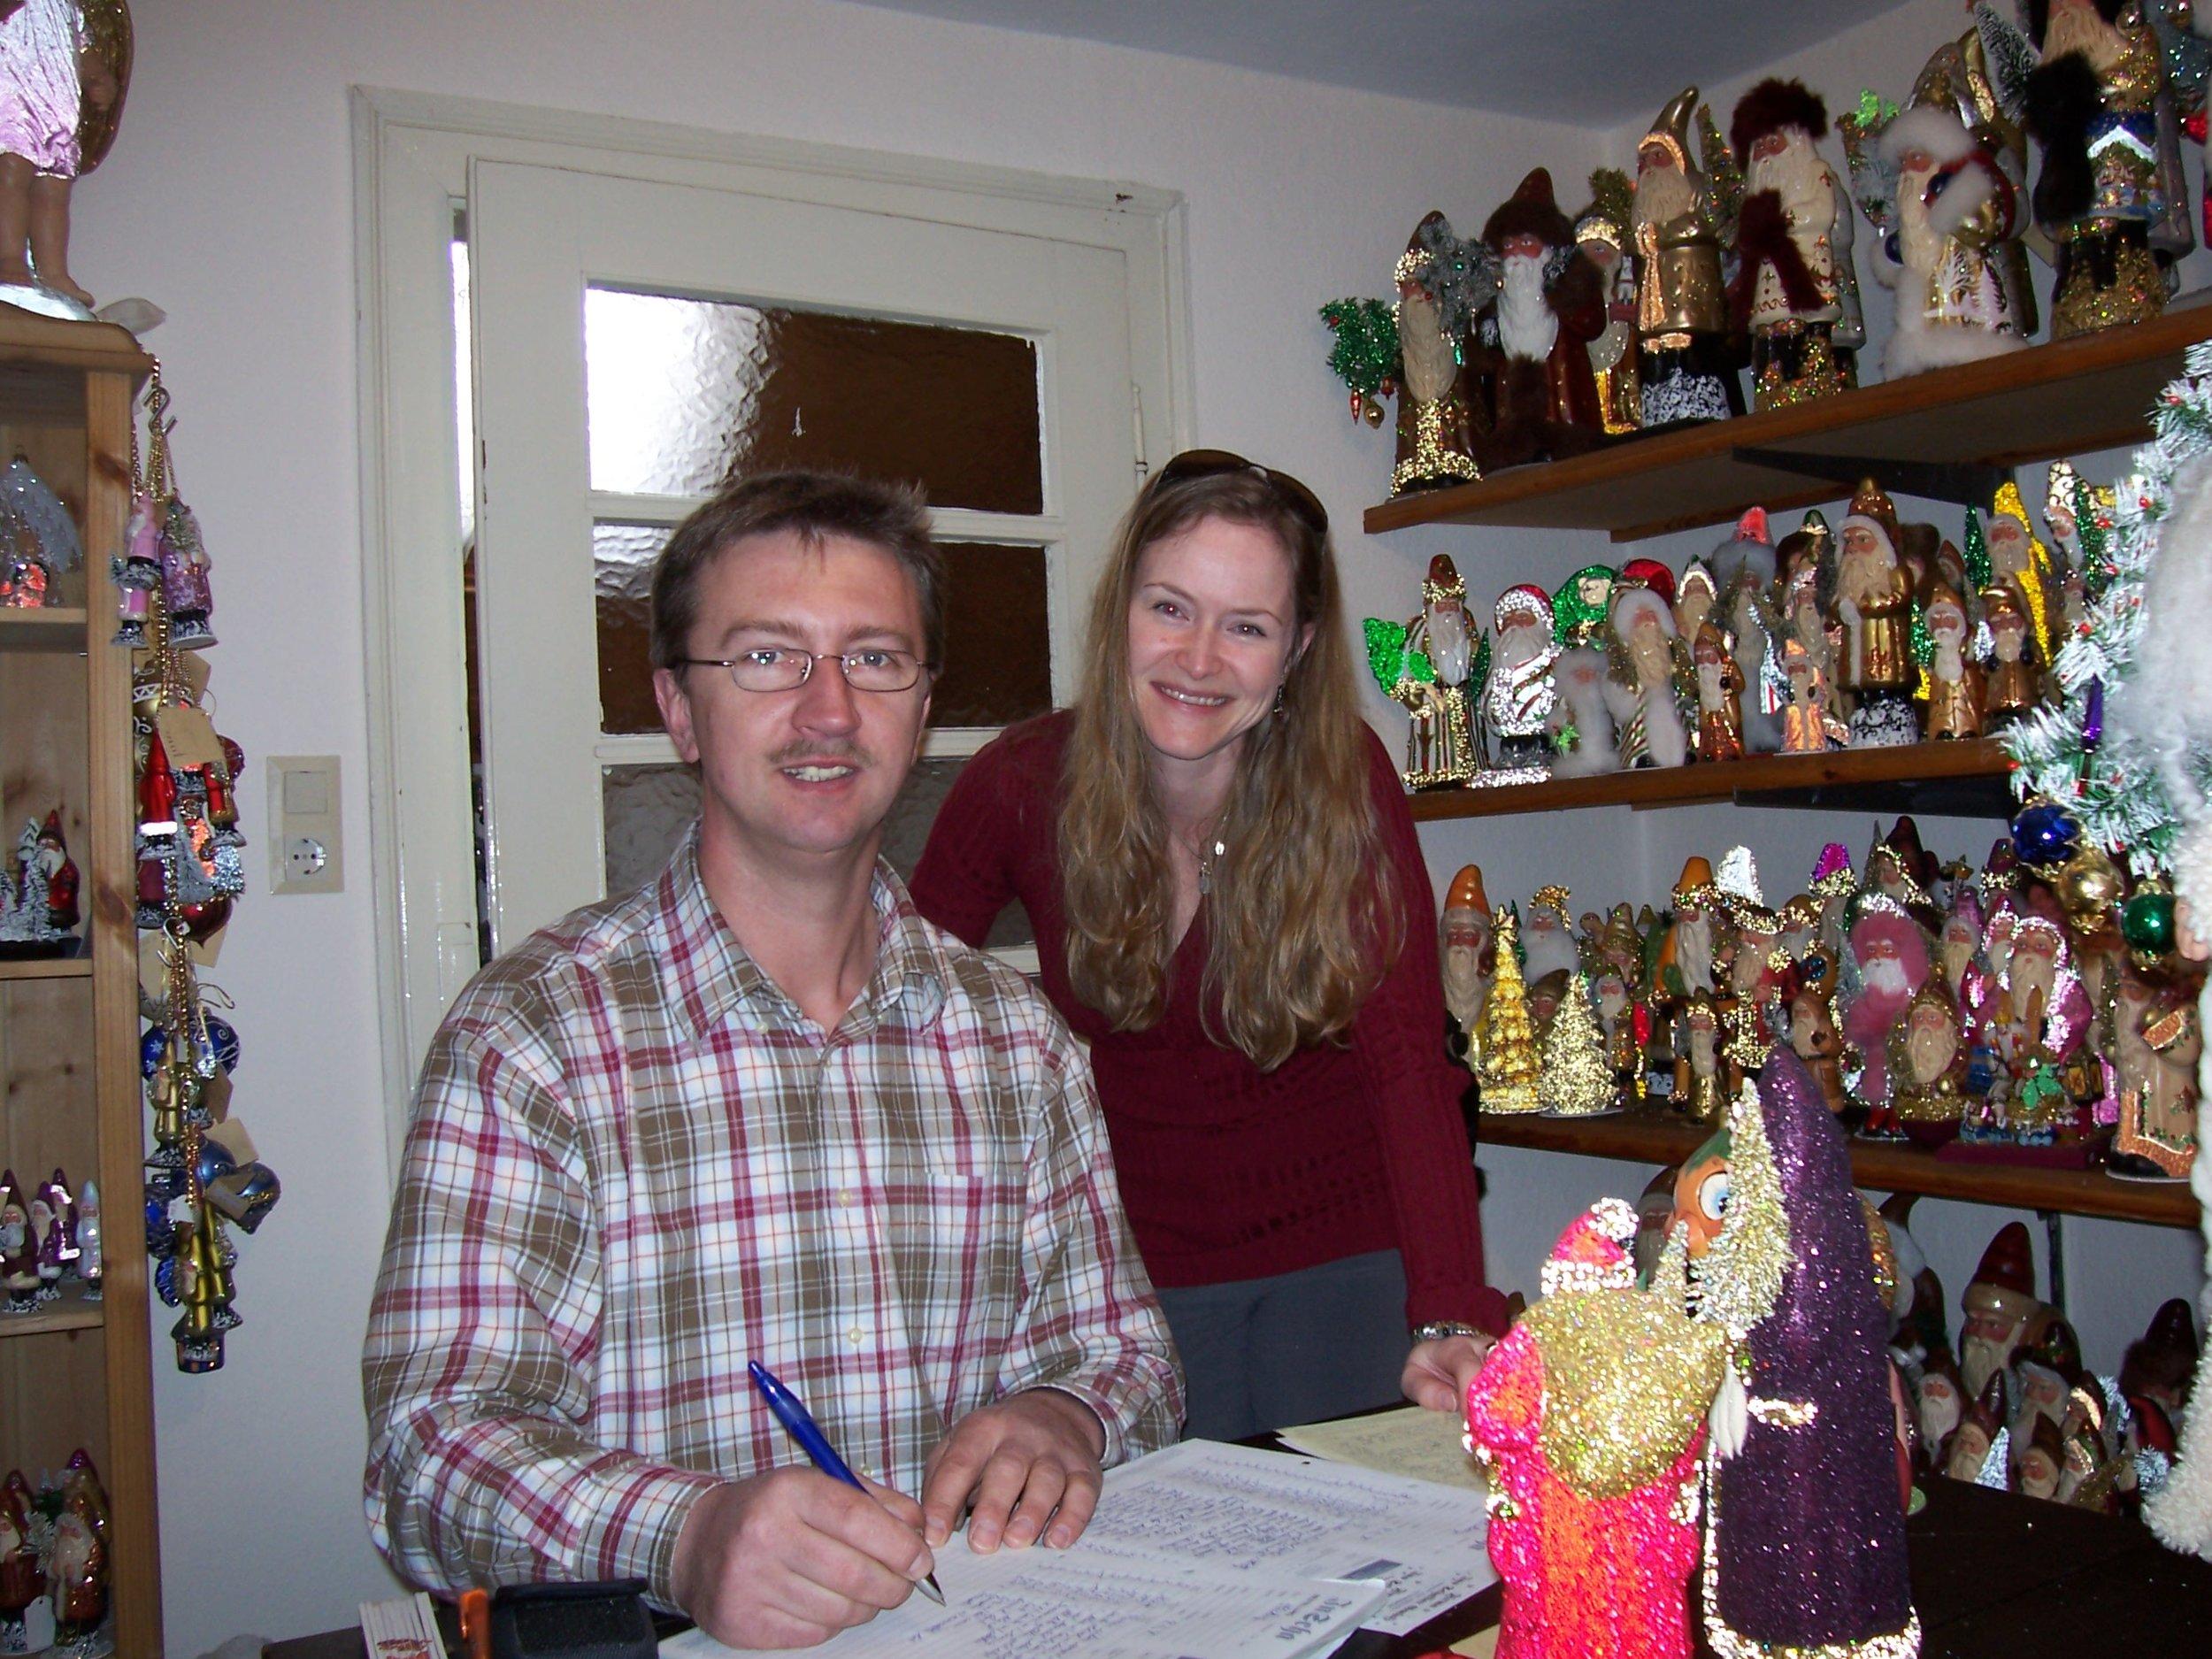 Loreen with Thomas Schaller - head of the Ino Schaller company.